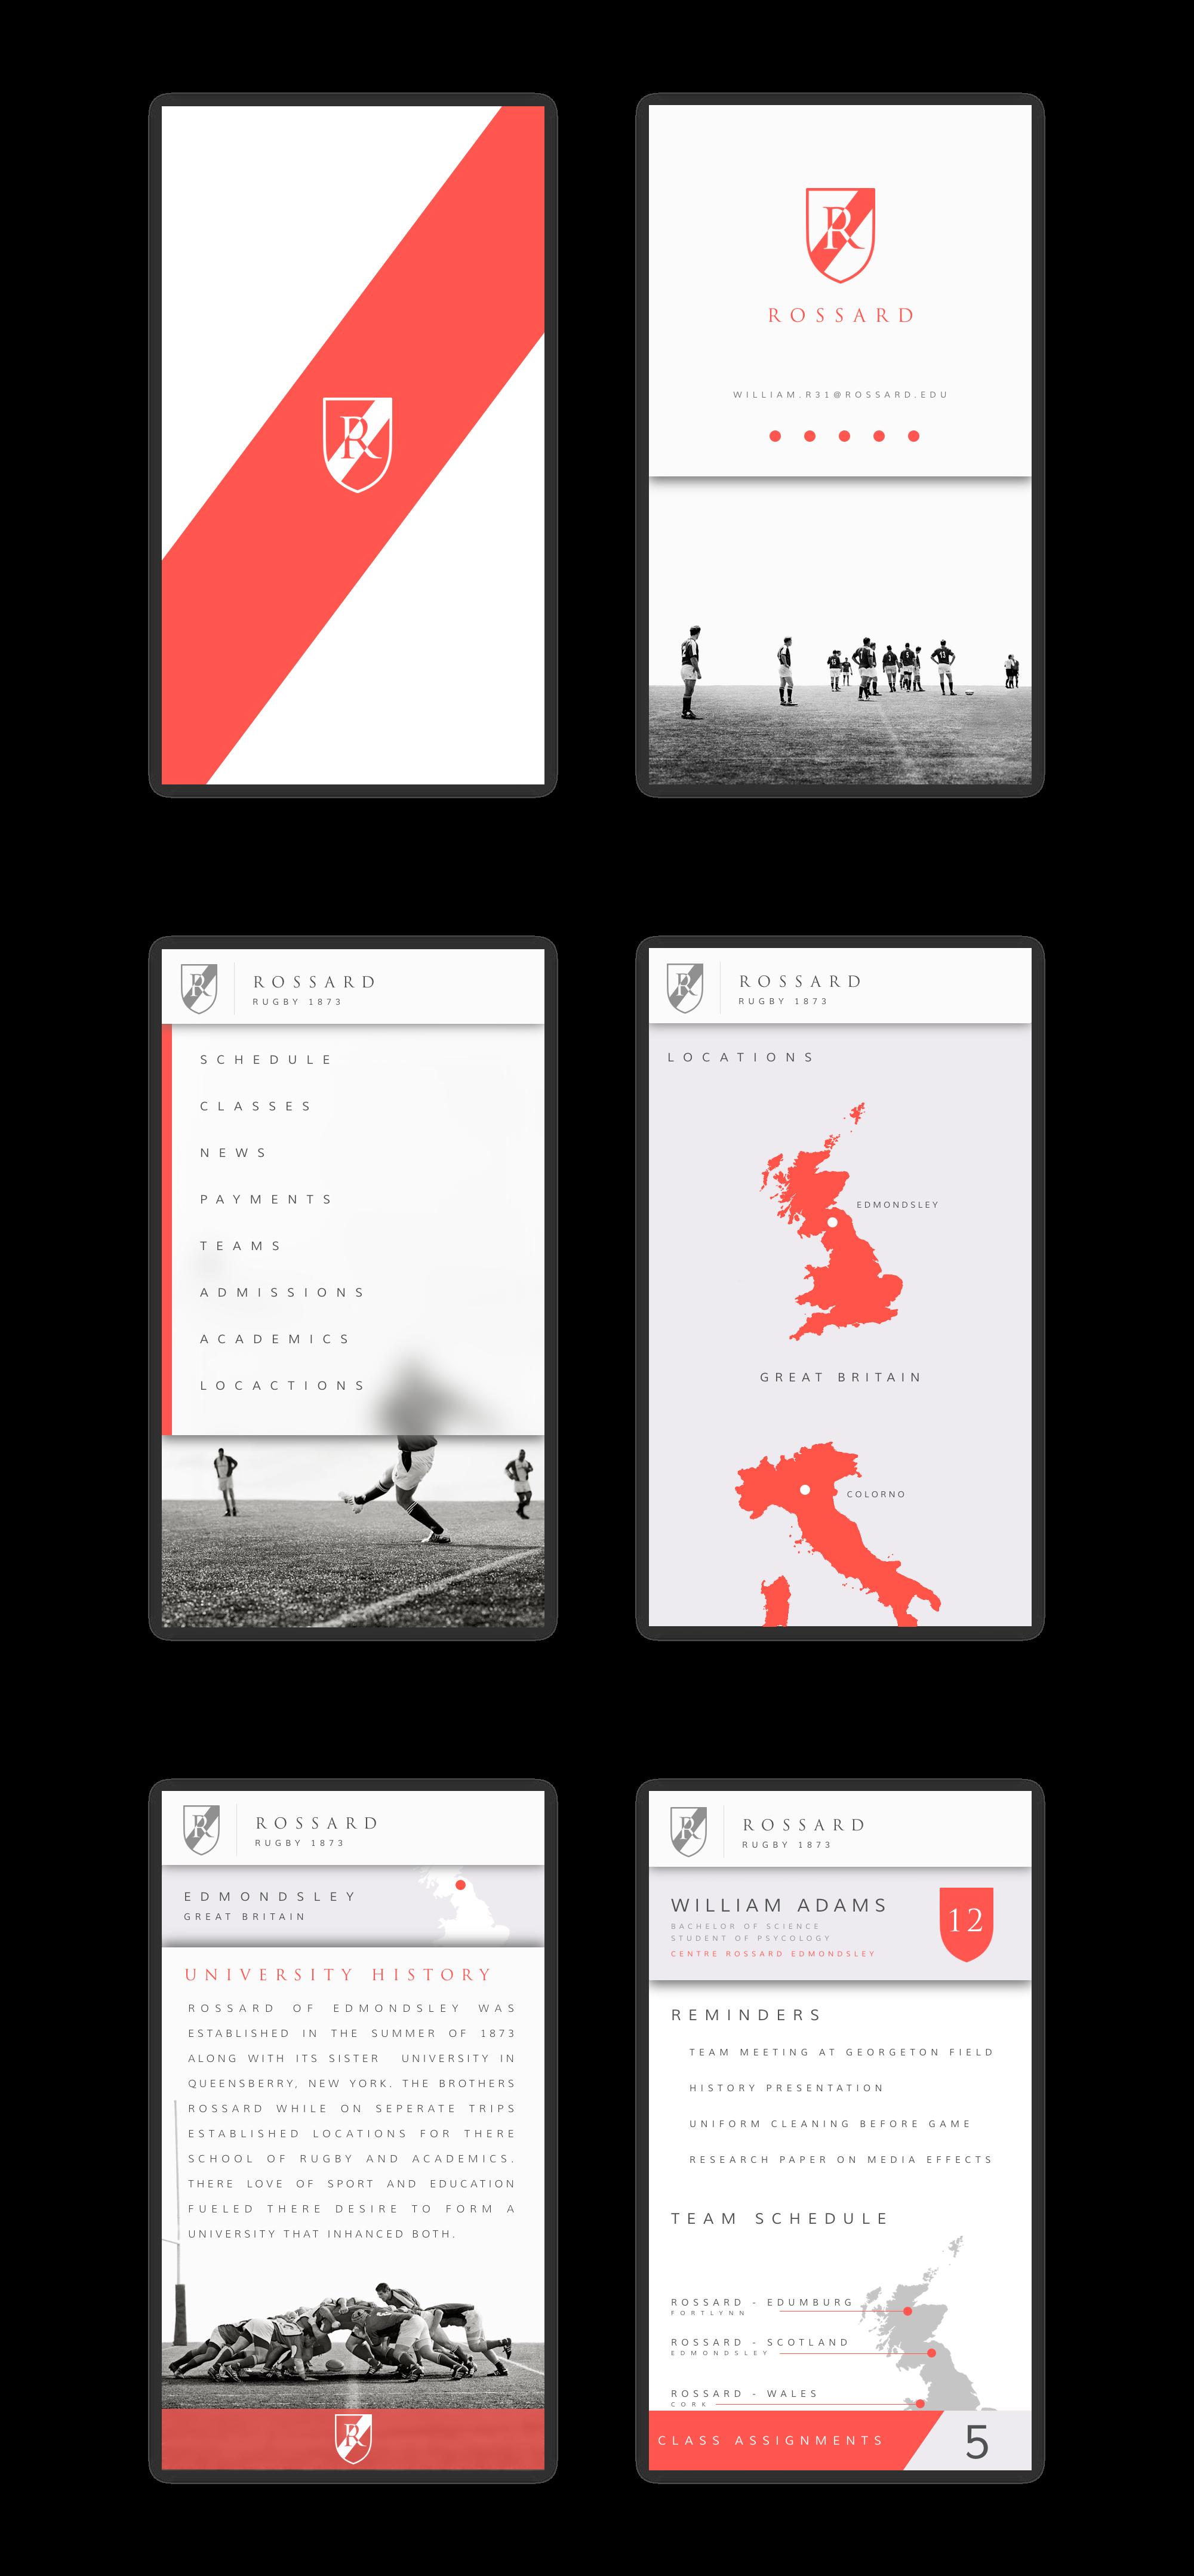 Rothridge iPhone Screens.png